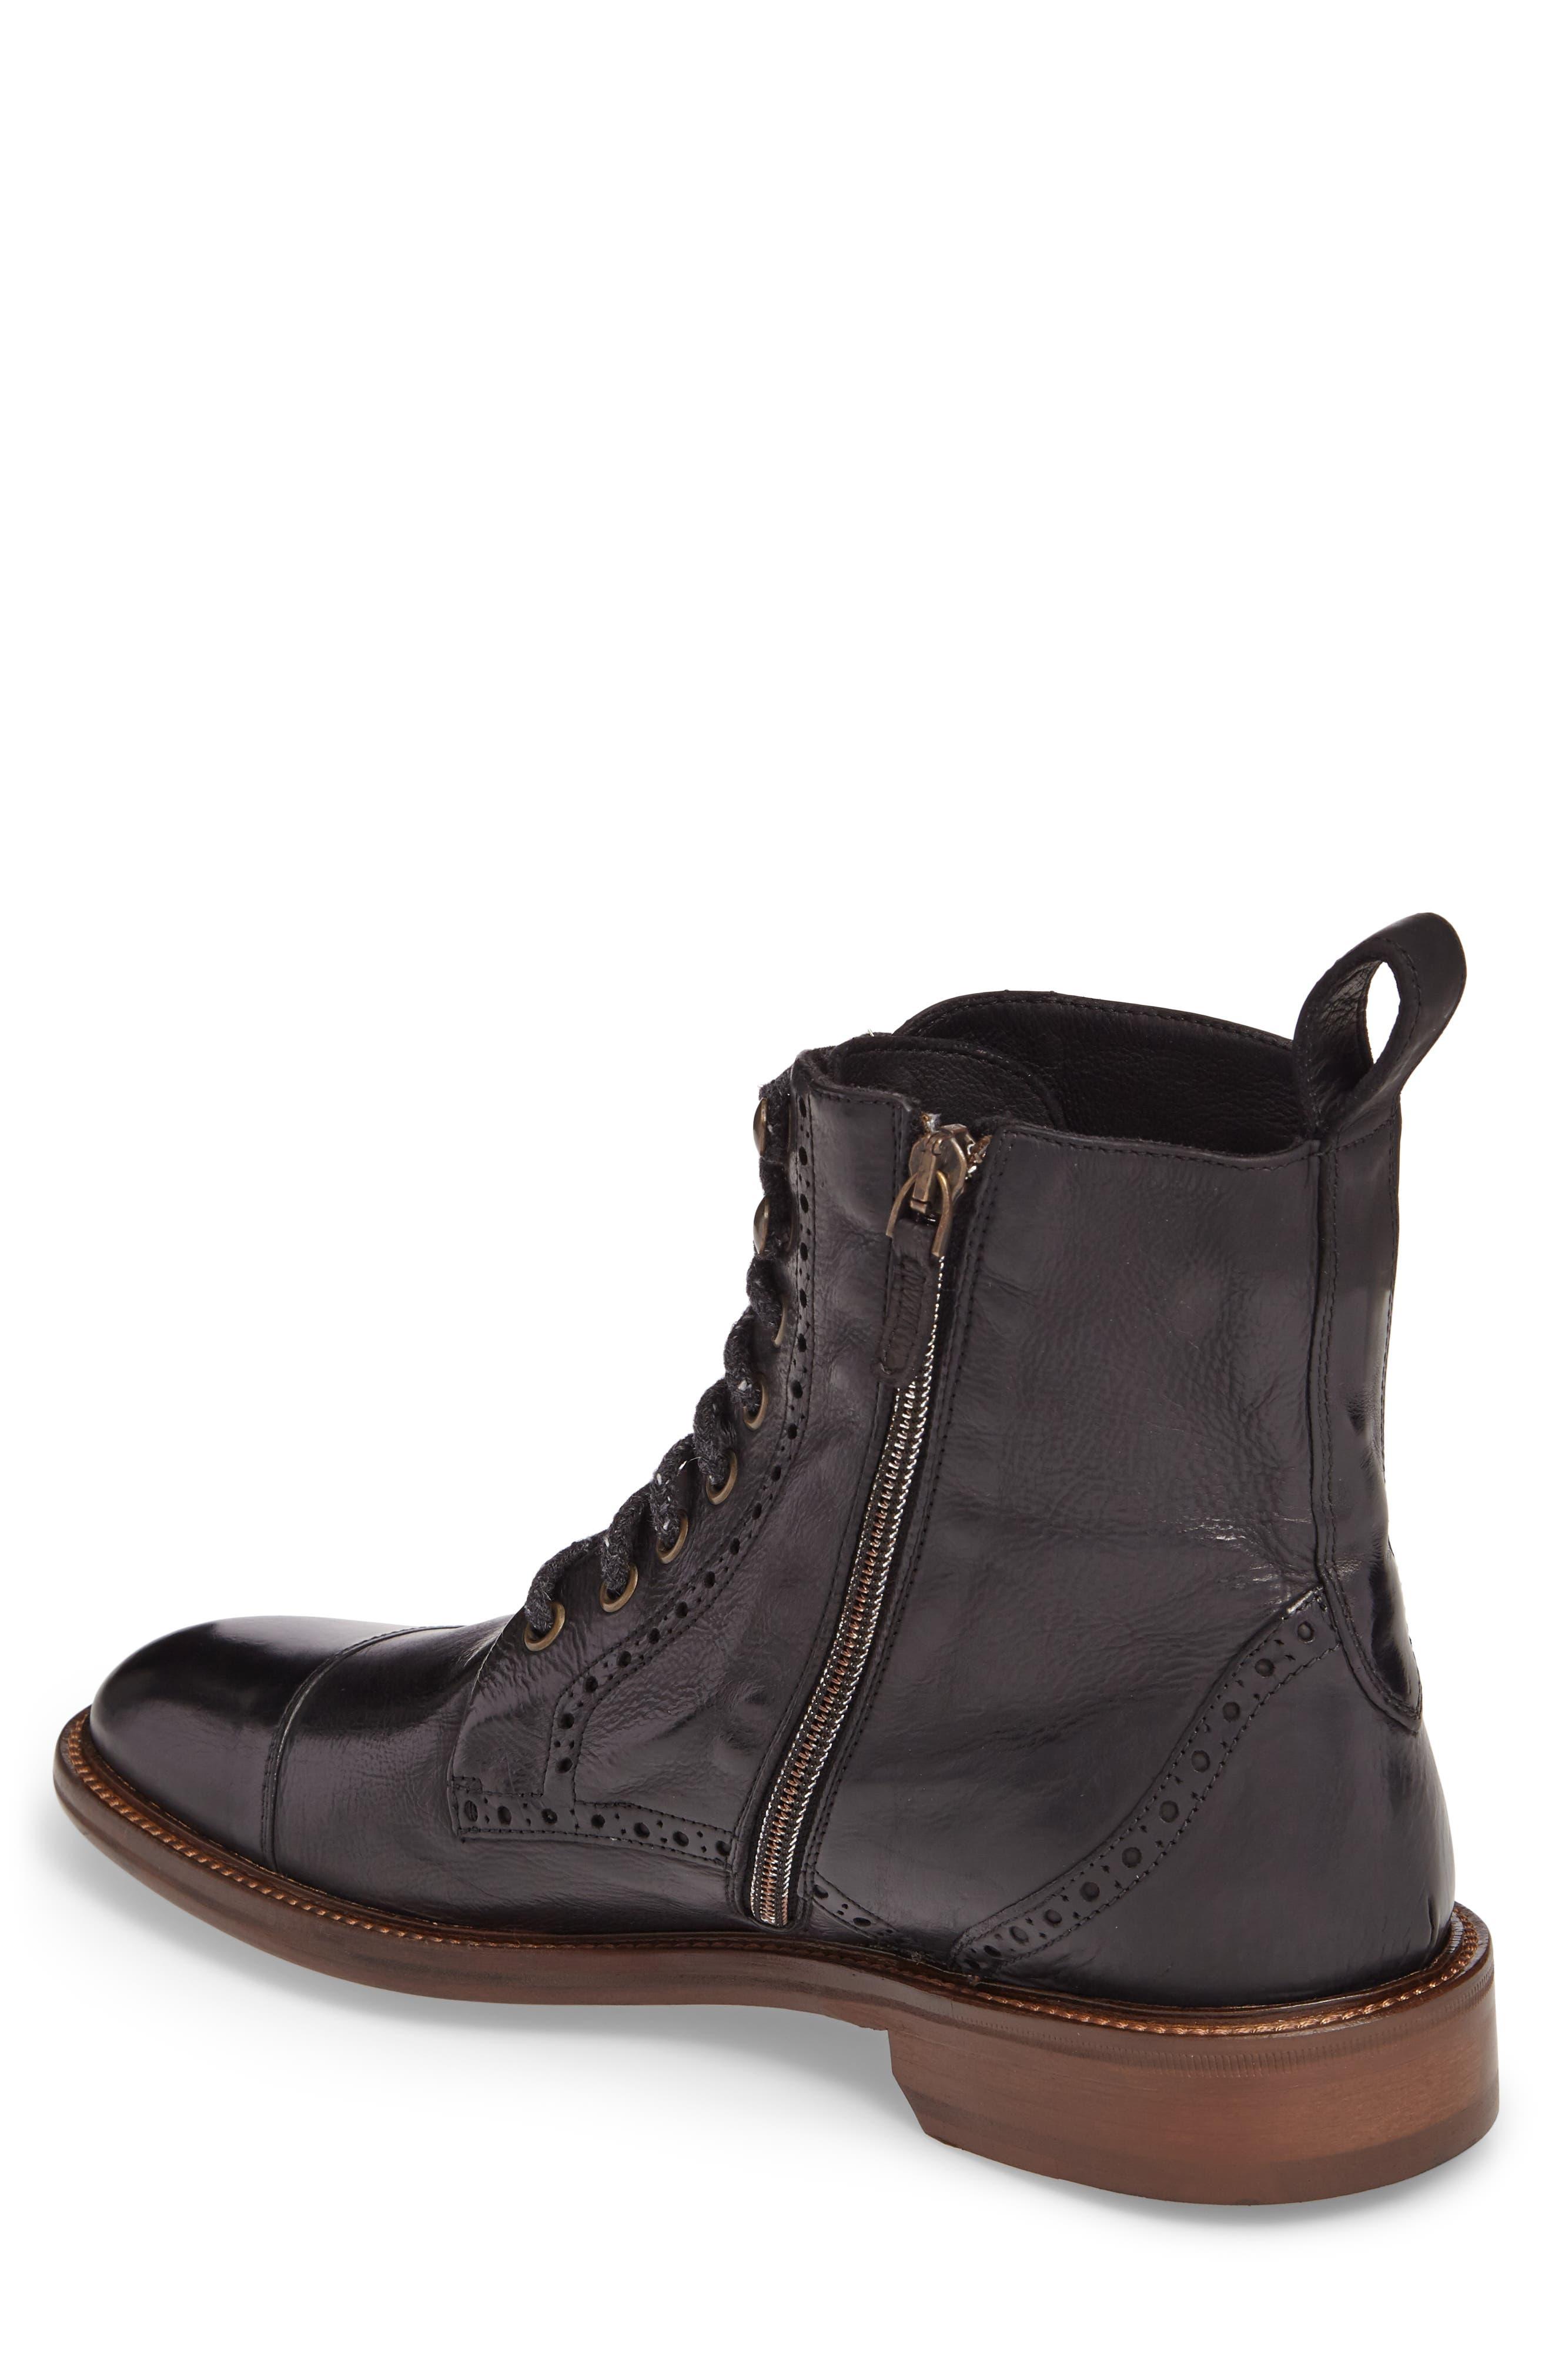 Alternate Image 2  - J&M 1850 Bryson Cap Toe Boot (Men)